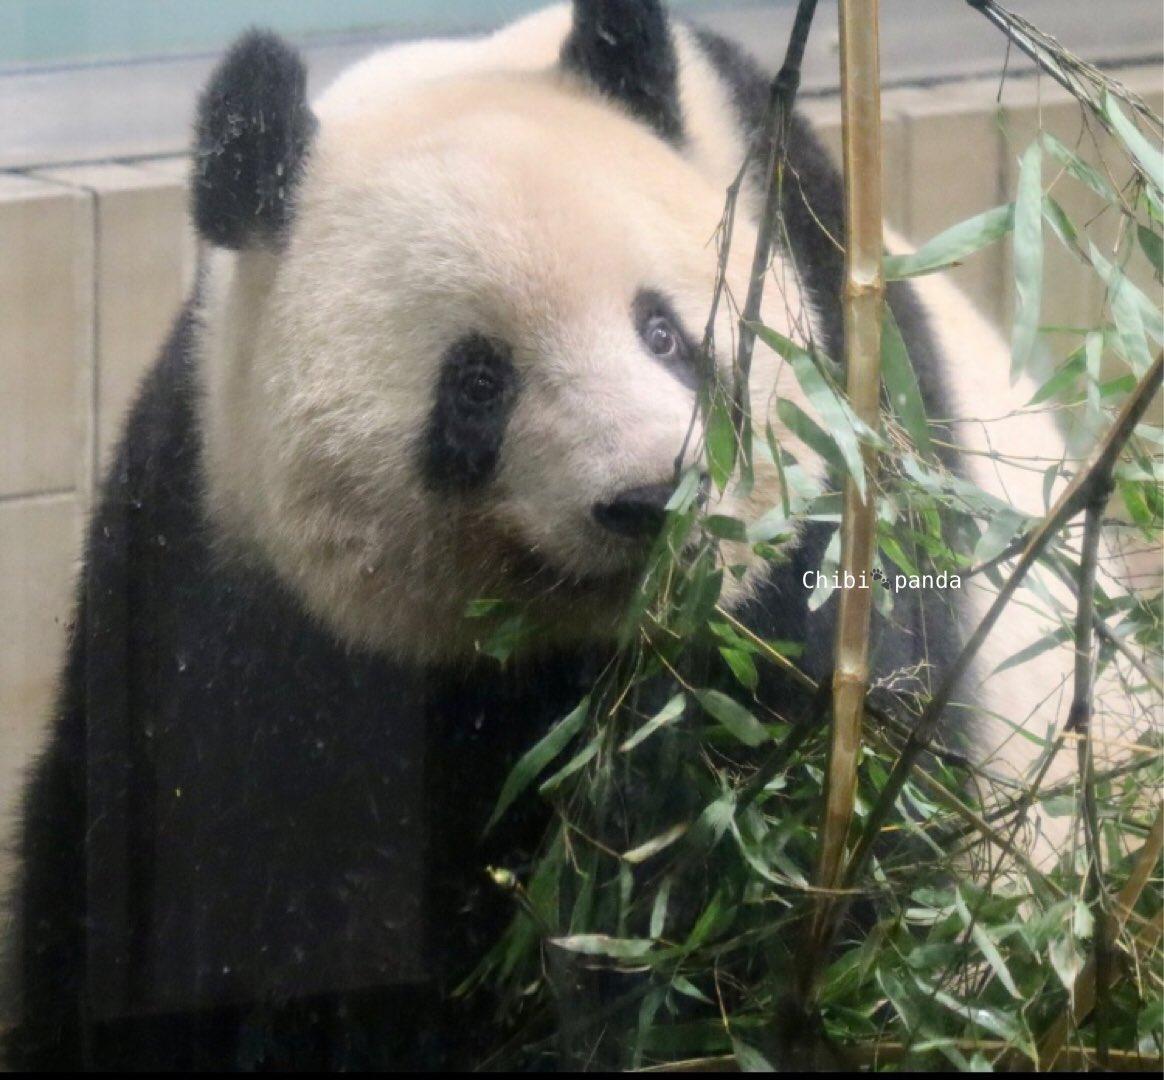 test ツイッターメディア - シャンちゃん嬉しそう😊この後食べてたのでおいしい枝見つけた❗️の顔かも🌿🐼🎵 シャンちゃんって表情豊かでそういうところもかわいくて大好き😆💕会いたいなぁ。  #シャンシャン #香香 #xiangxiang  #ジャイアントパンダ #giantpanda #上野動物園 #uenozoo https://t.co/h5u3aJdmDy